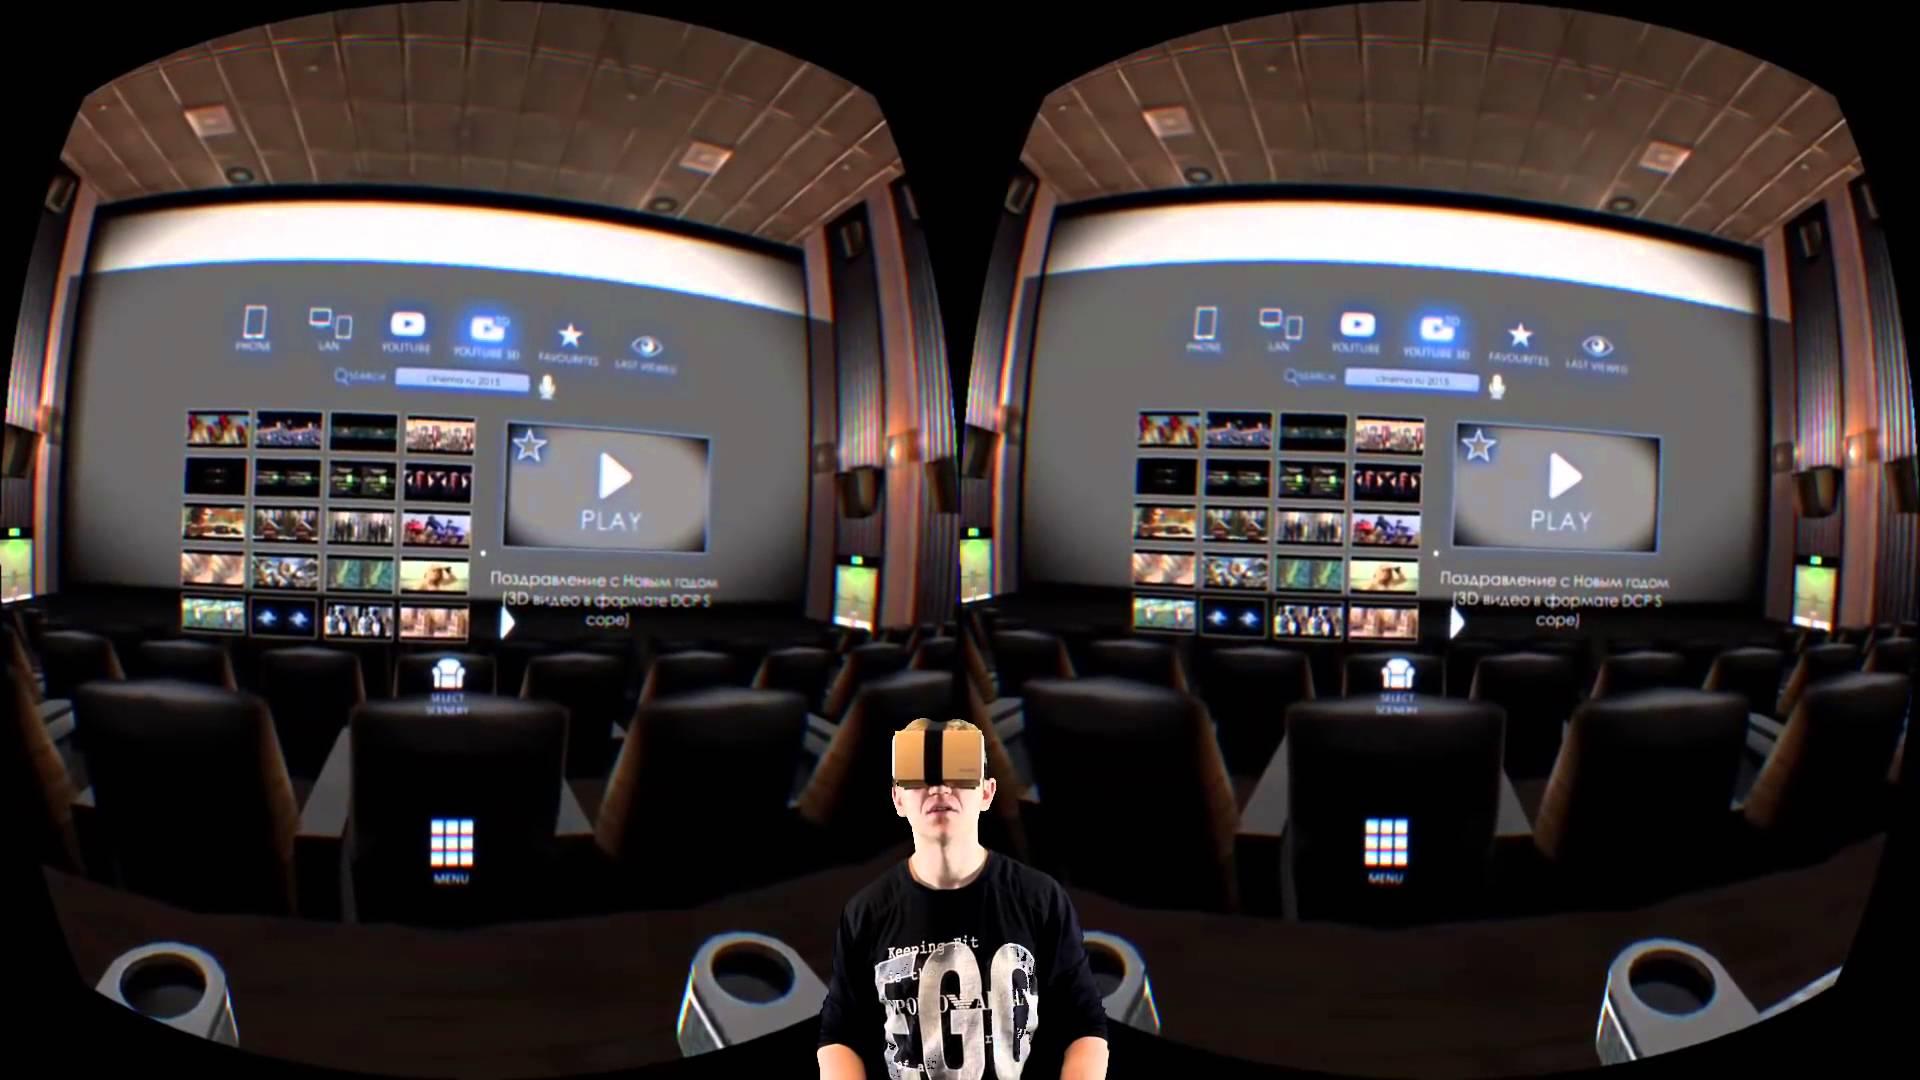 Playing 3D Blu-ray on Cmoar VR